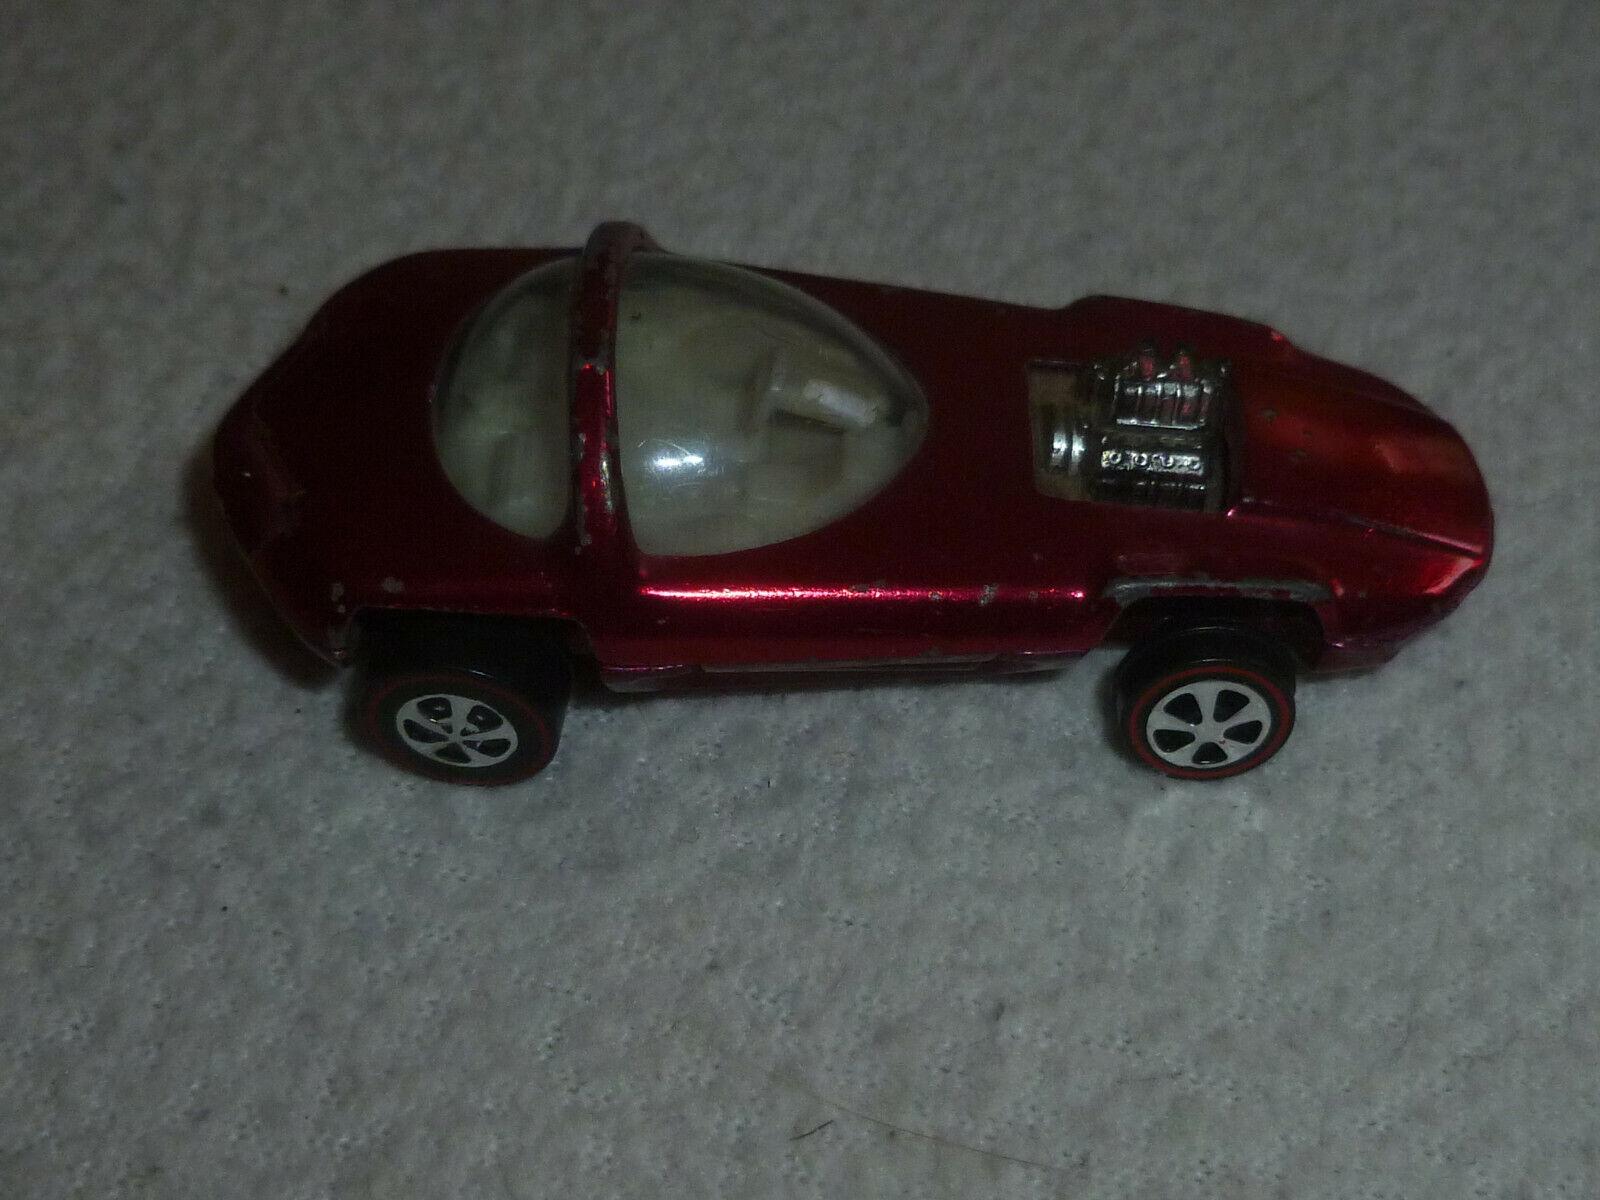 Vintage HOTWHEELS rougeline Silhouette 1968 Metallic rouge Line Hot Wheel Original